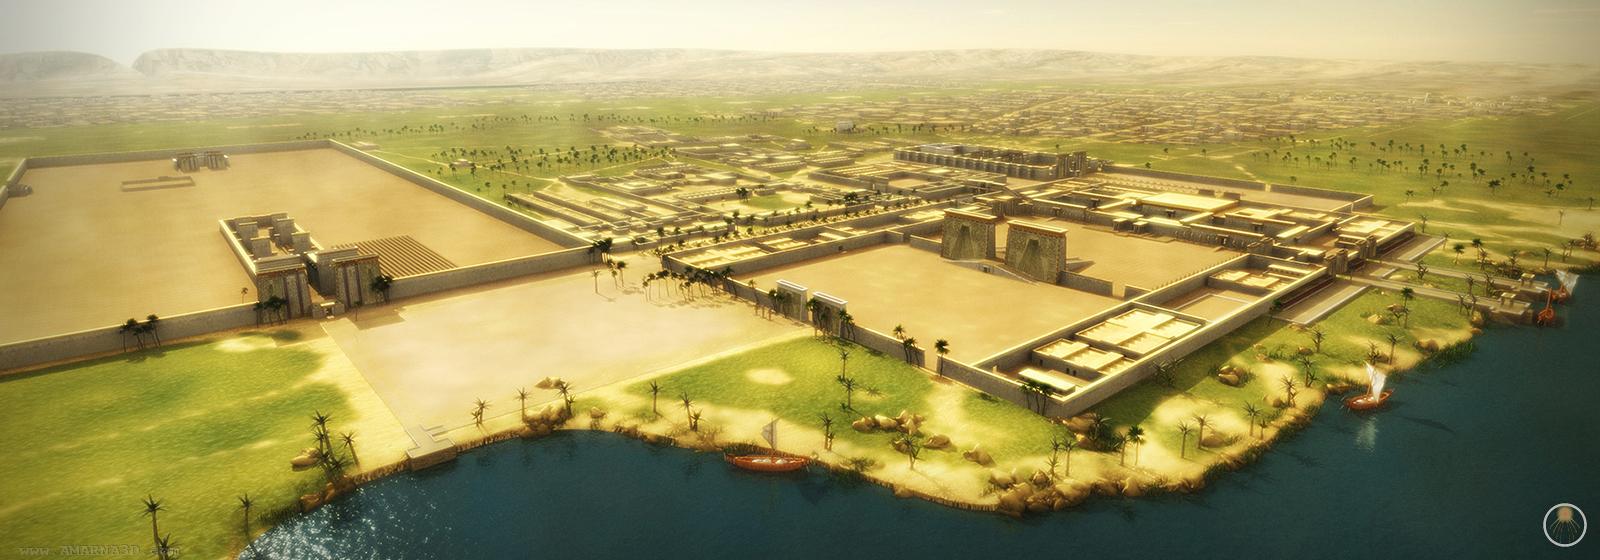 Amarna3D03